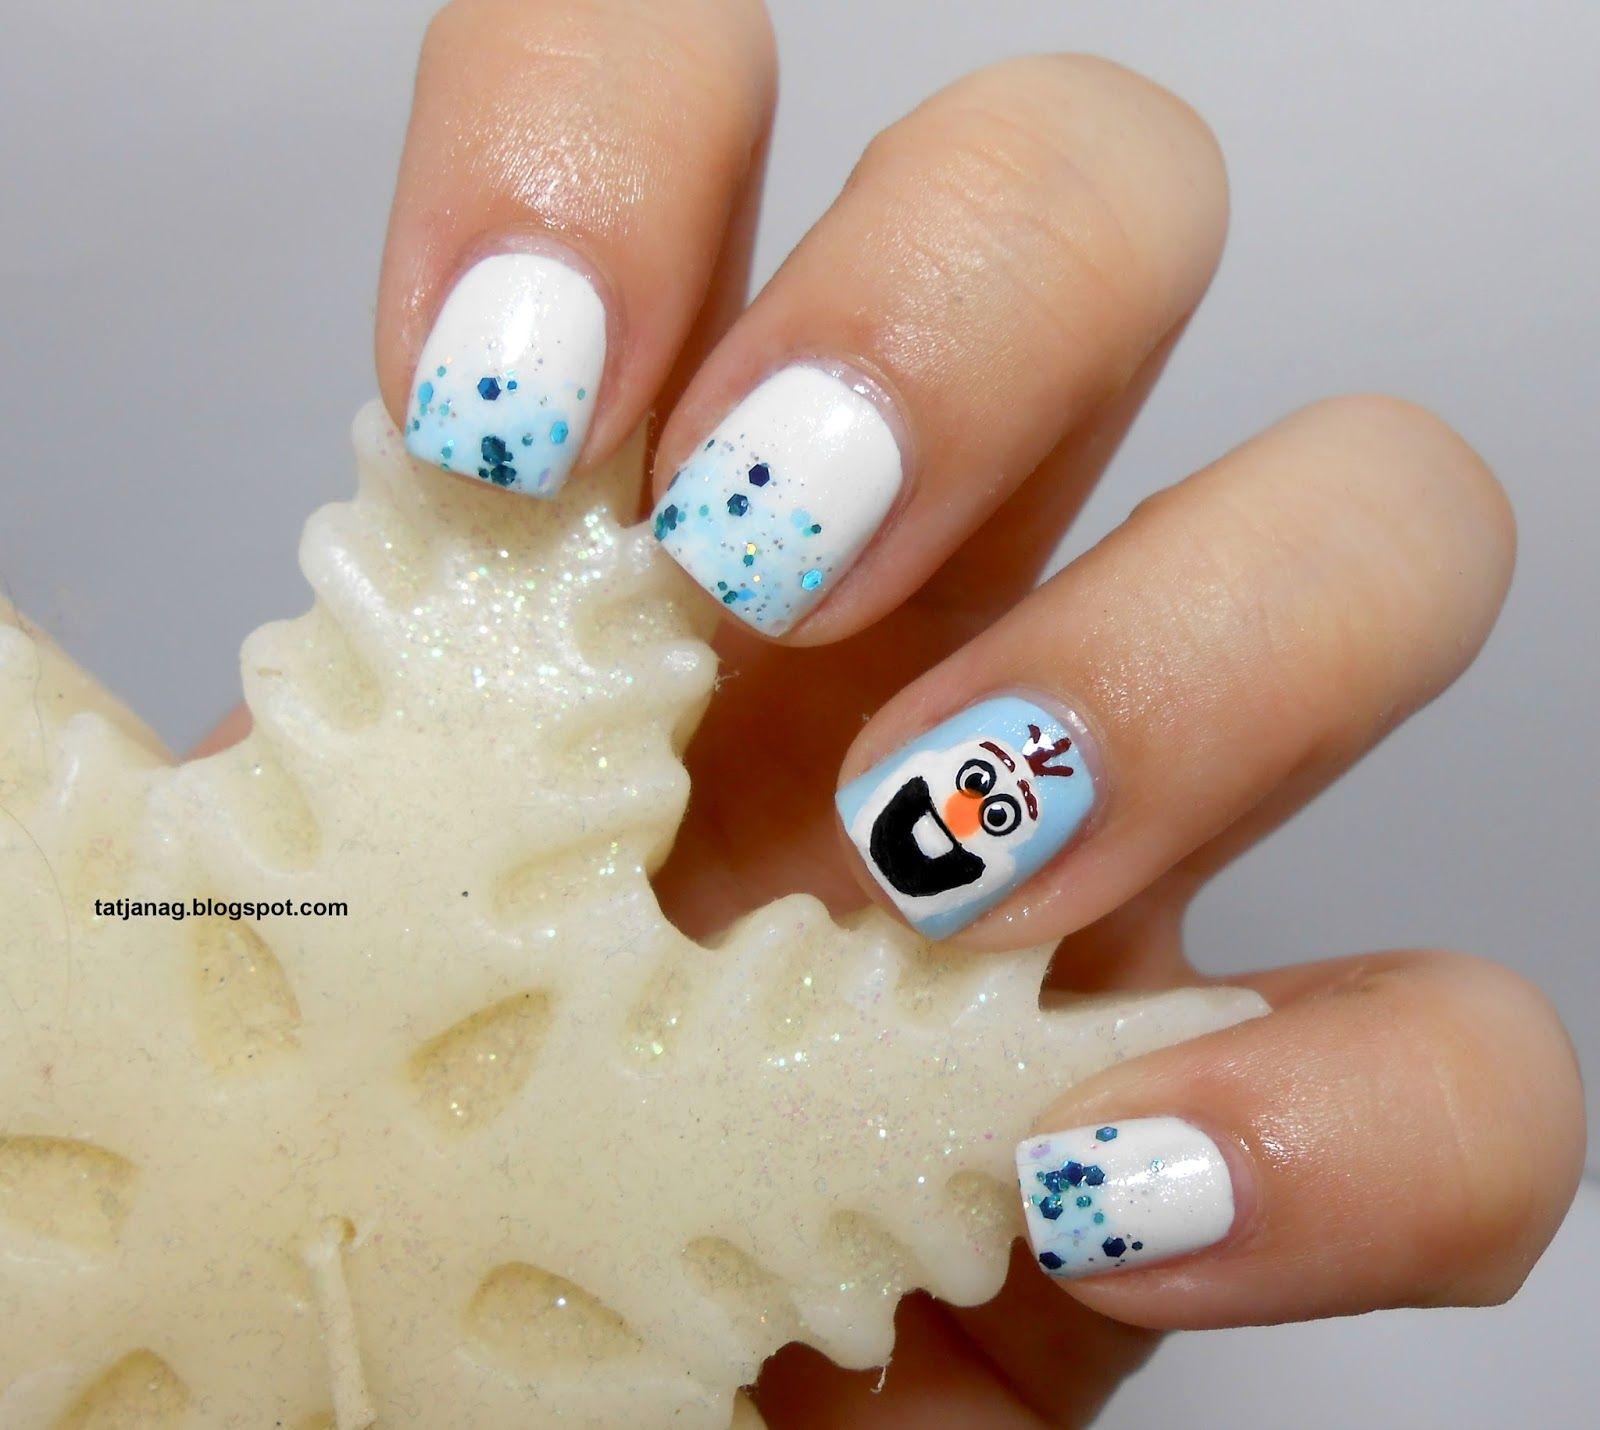 Frozen Series: Olaf nail art | My Nail Art | Pinterest | Olaf nails ...